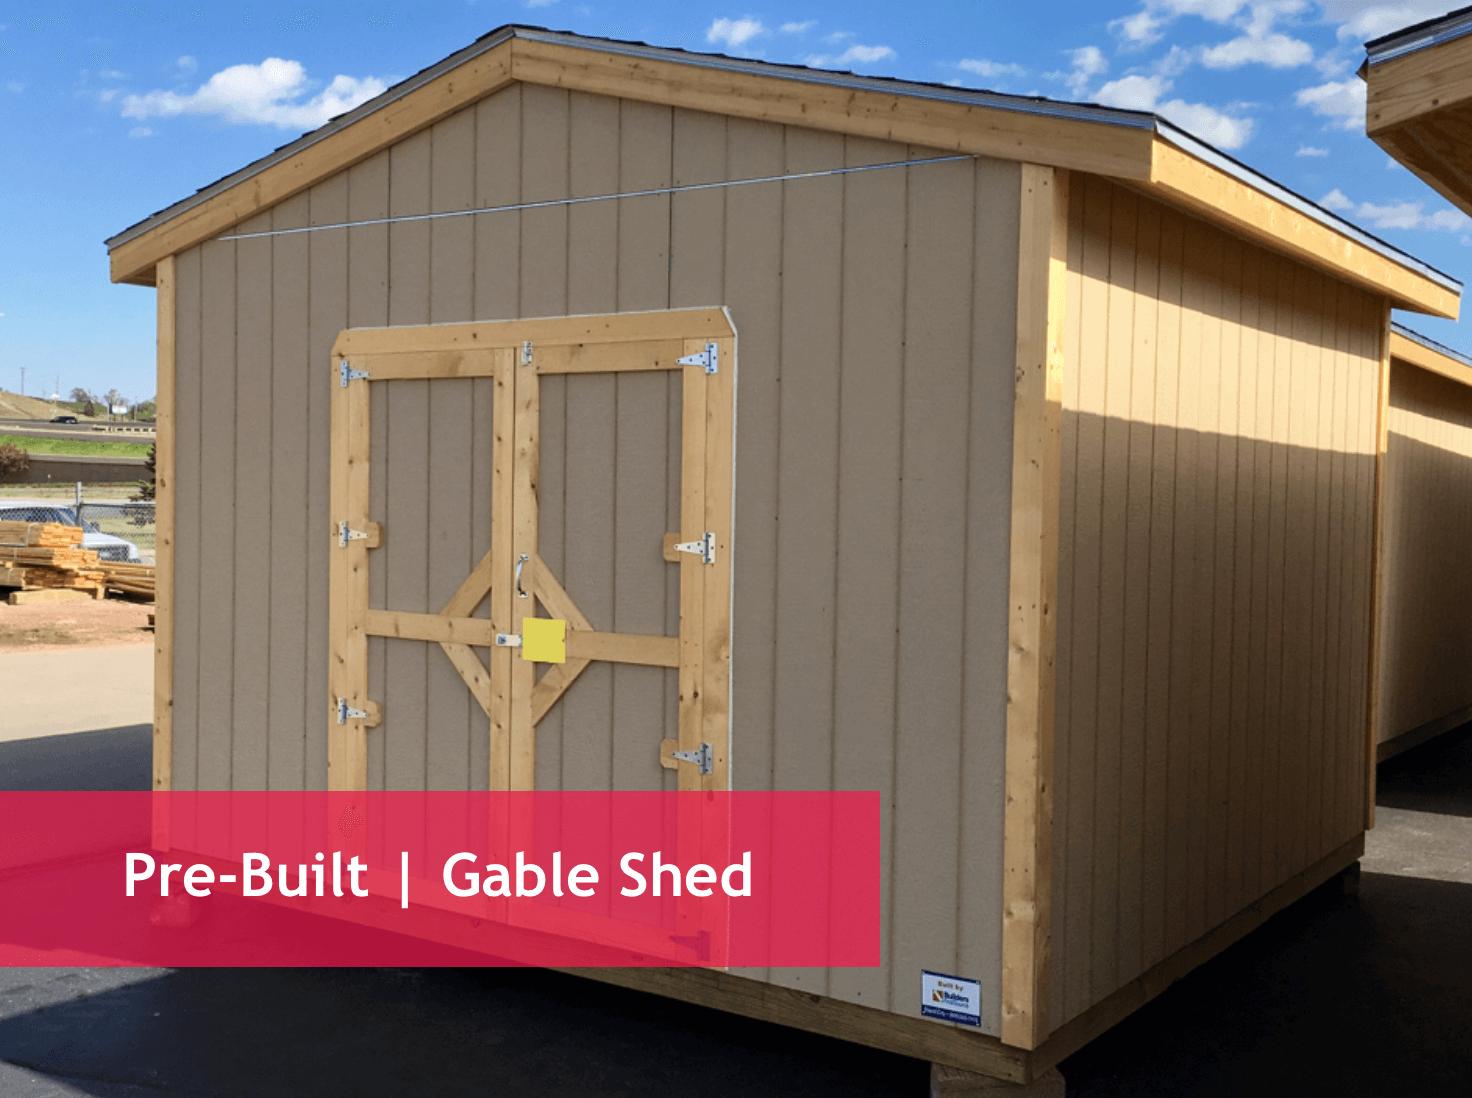 "Economy Gables (2' O.C. Walls)   8x8 | 8x10 | 8x12   Standard Gables (16"" O.C. Walls)   8x16 | 12x12 | 12x16 | 12x20  Eaves Overhangs Standard   Shed Specs:    Floor:  Treated 2x floor joists with 3/4"" T&G plywood/OSB floor   Framing : 2x4 walls with 1' eave overhangs   Walls : 7'4"" sidewall   Shingles : Laminated shingles over 15# felt   Siding : Primed LP SmartSide panel siding   Door : 4'x 6' openings on 8' wide sheds  5' x 6' openings on 12' wide sheds"